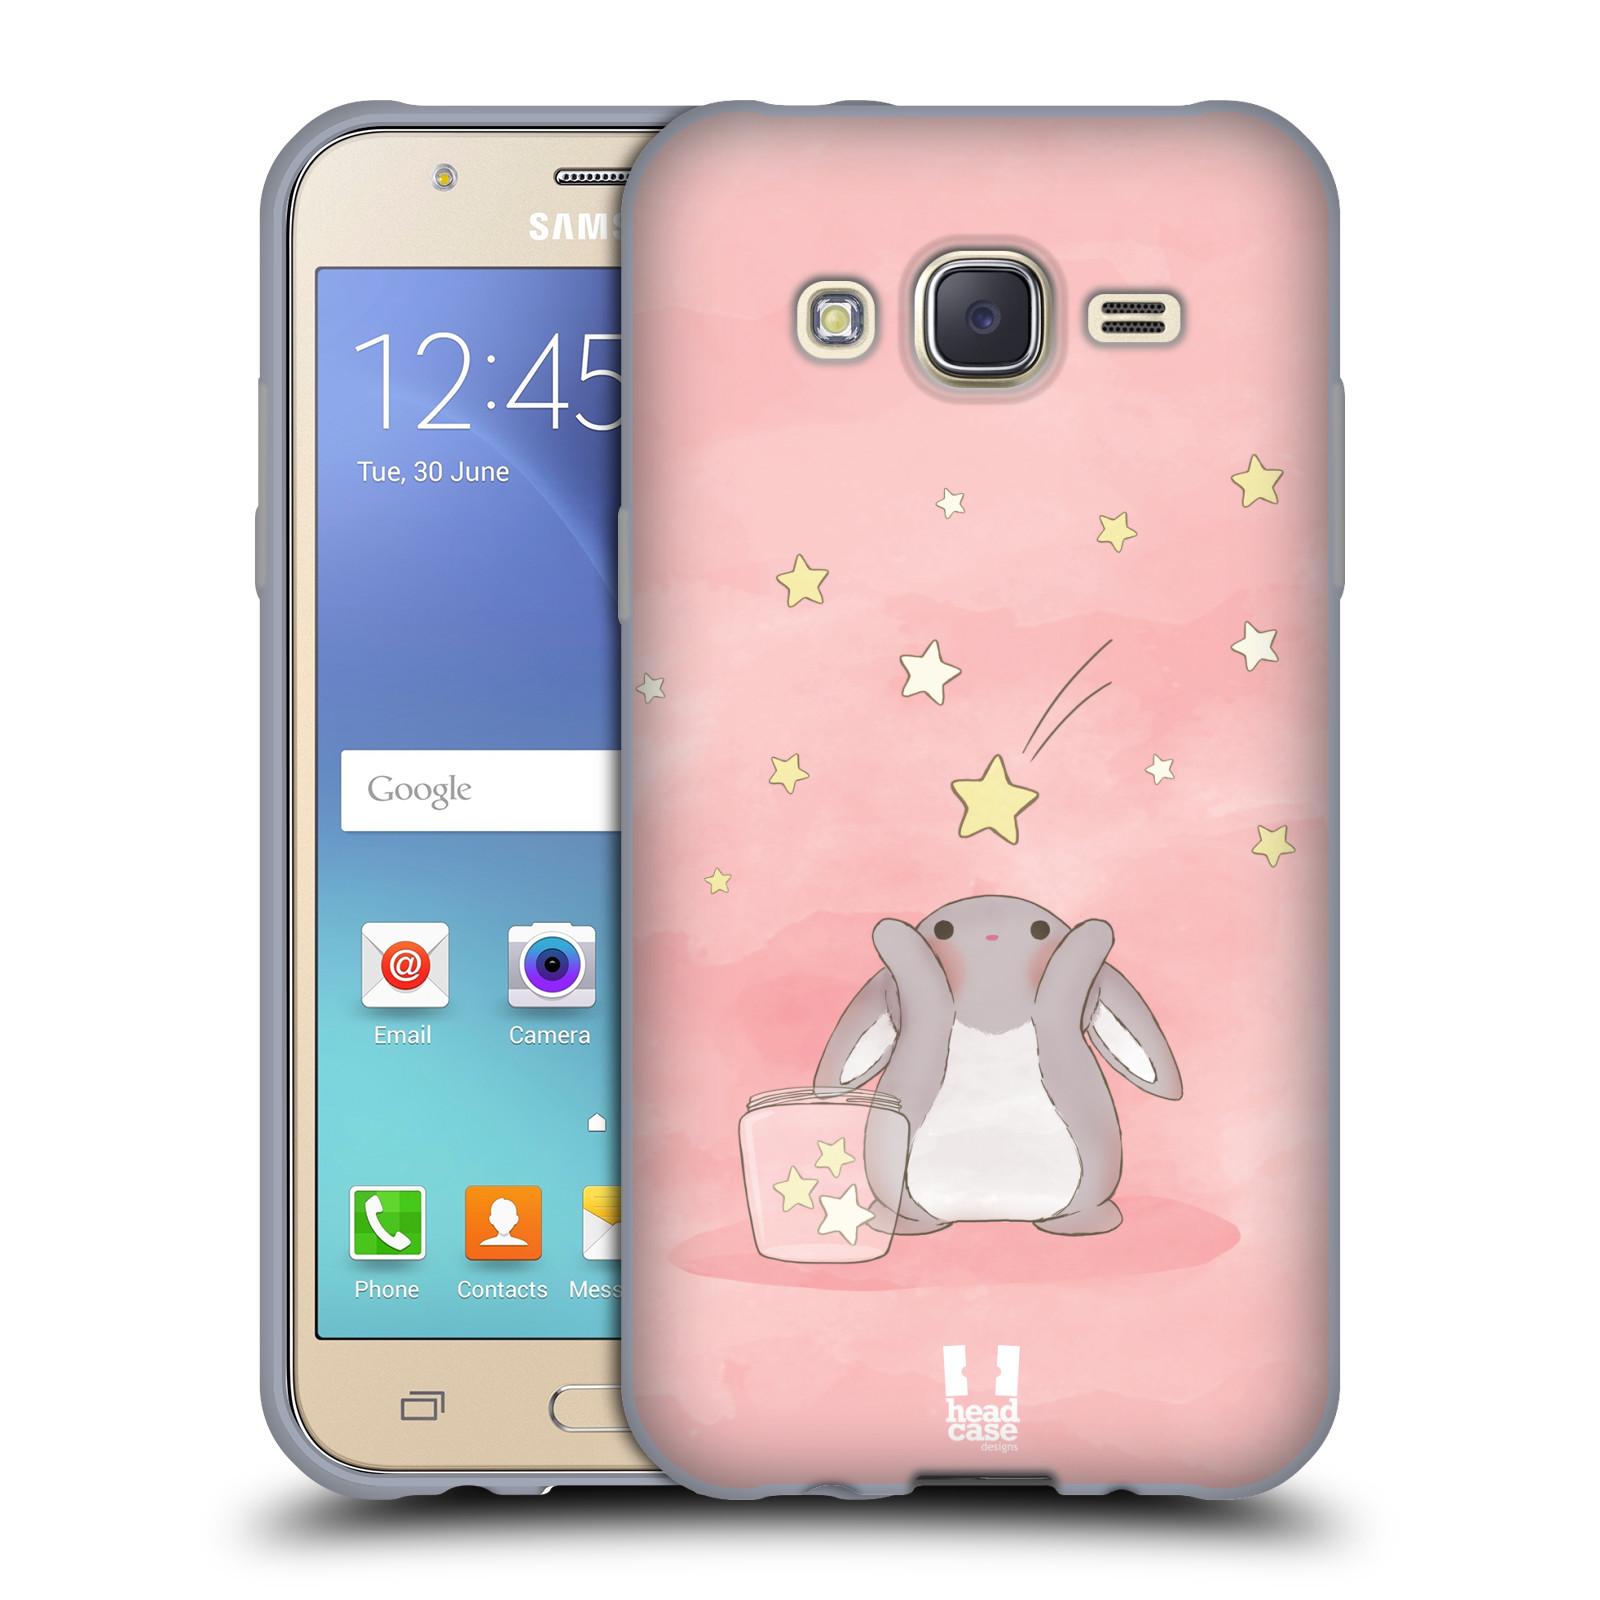 HEAD CASE silikonový obal na mobil Samsung Galaxy J5, J500, (J5 DUOS) vzor králíček a hvězdy růžová